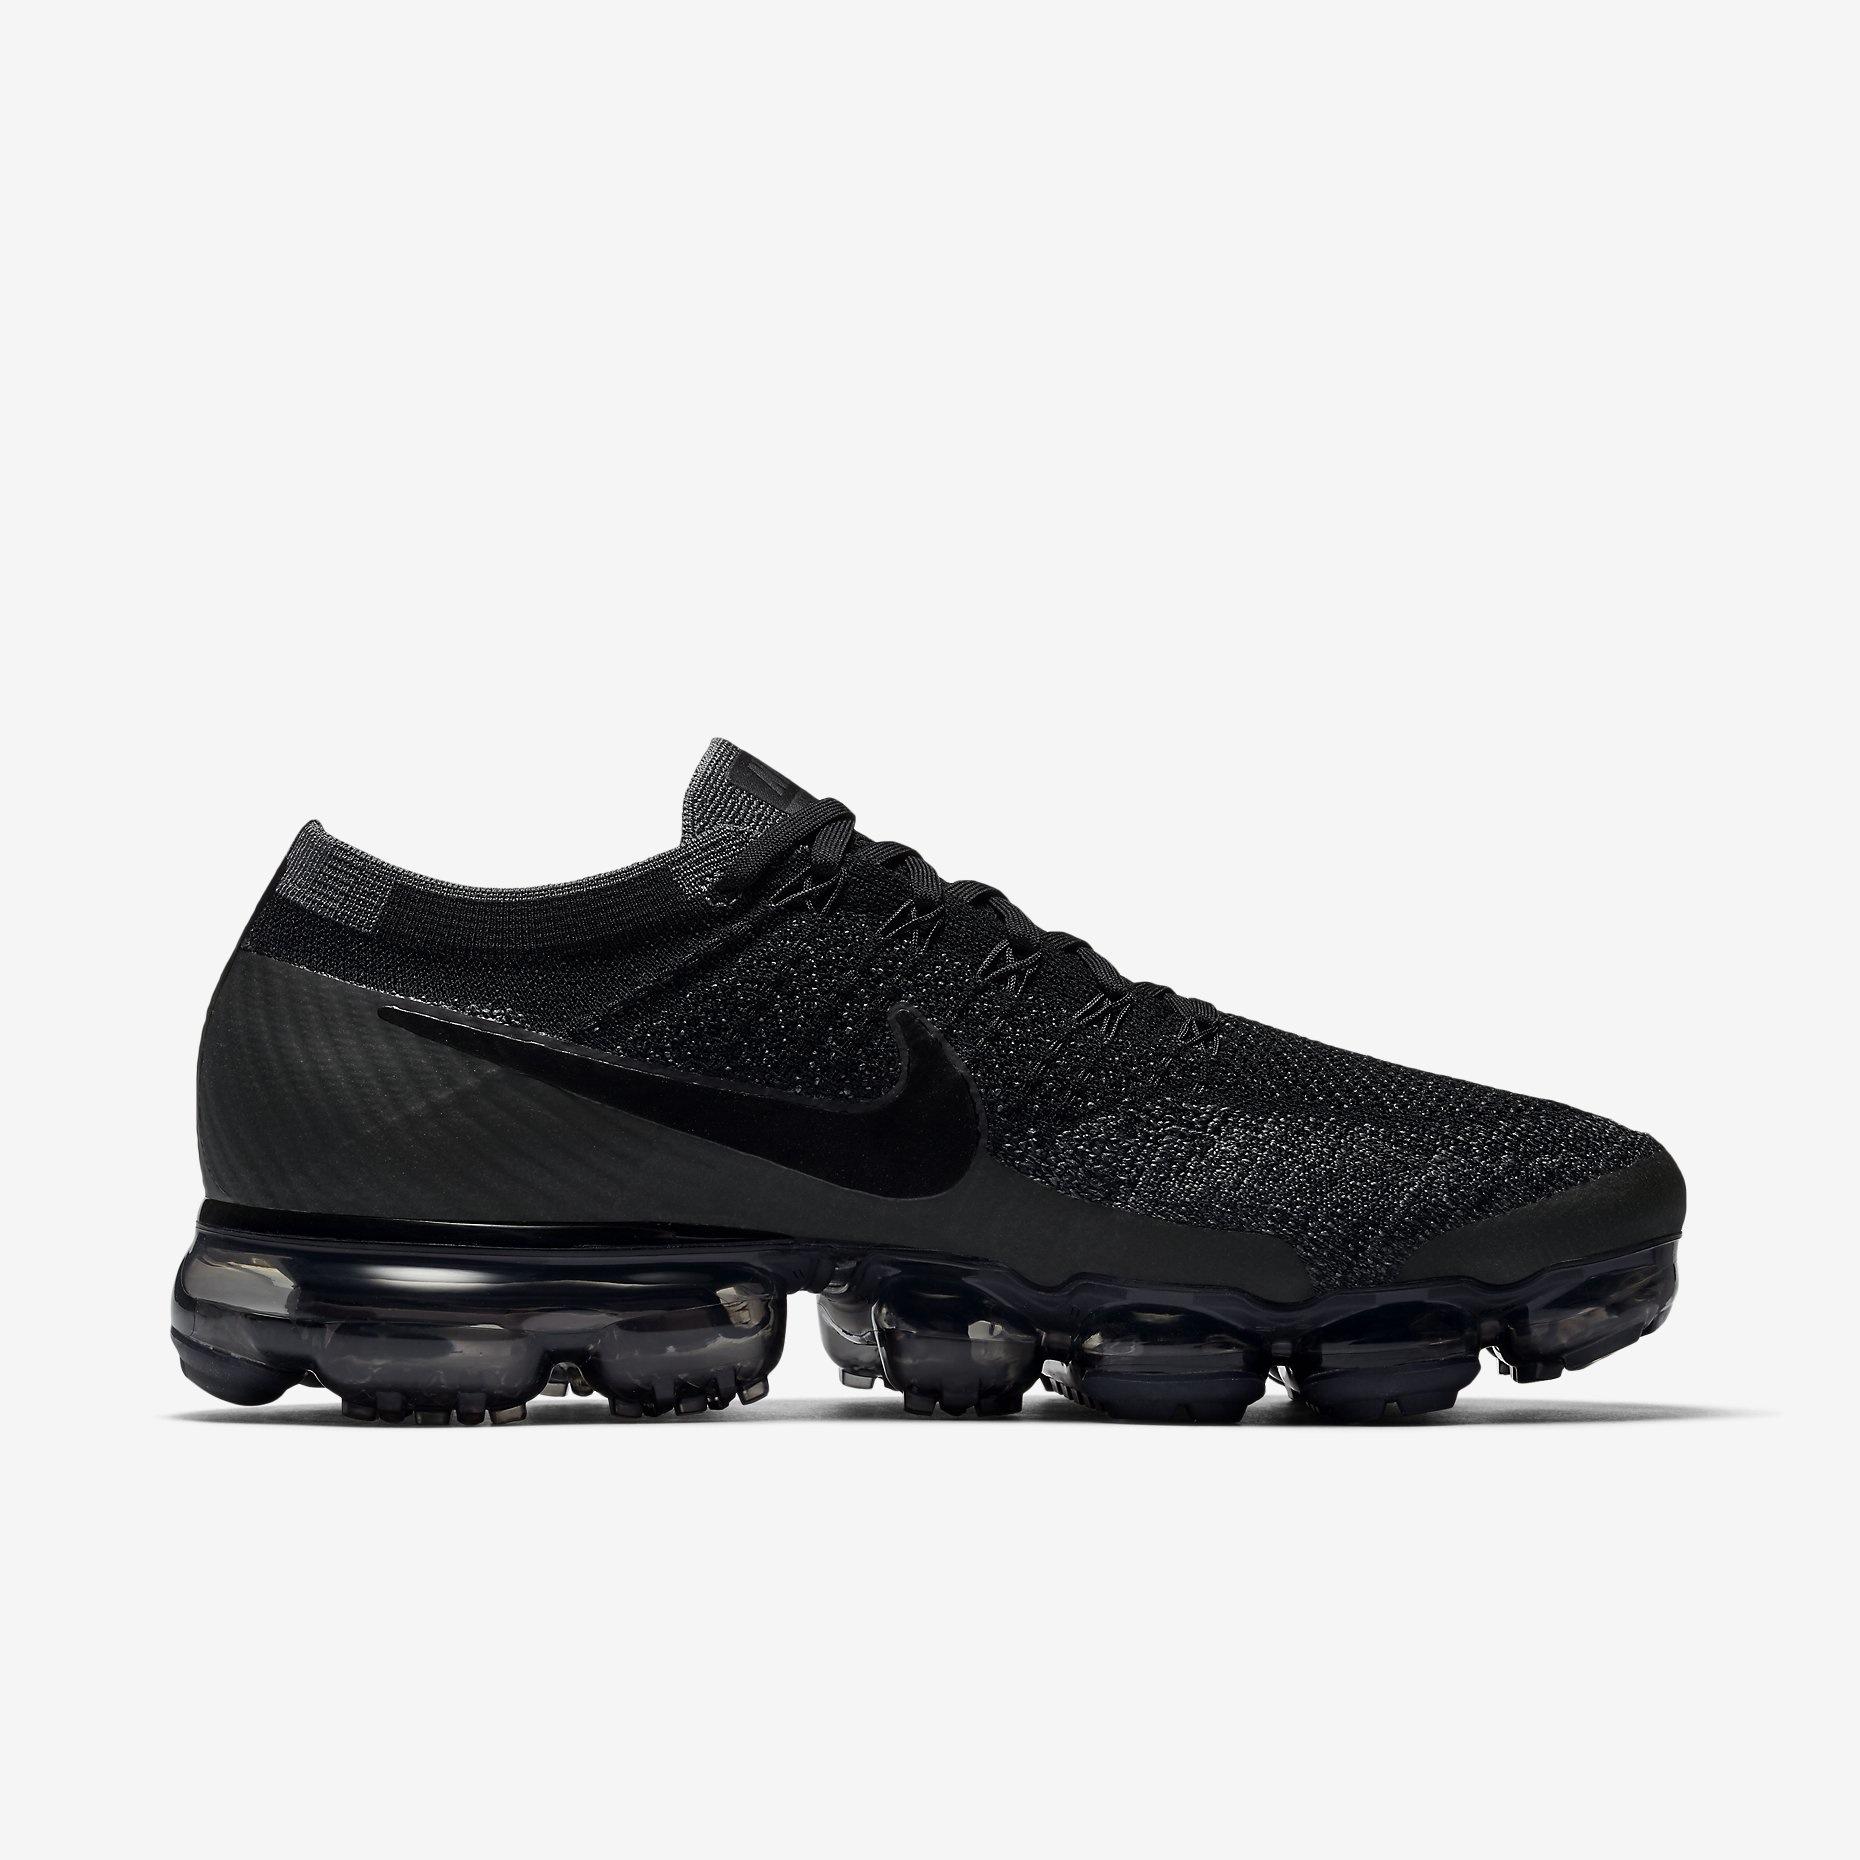 Nike Air Vapormax Flyknit Triple Black - Sneakers.fr